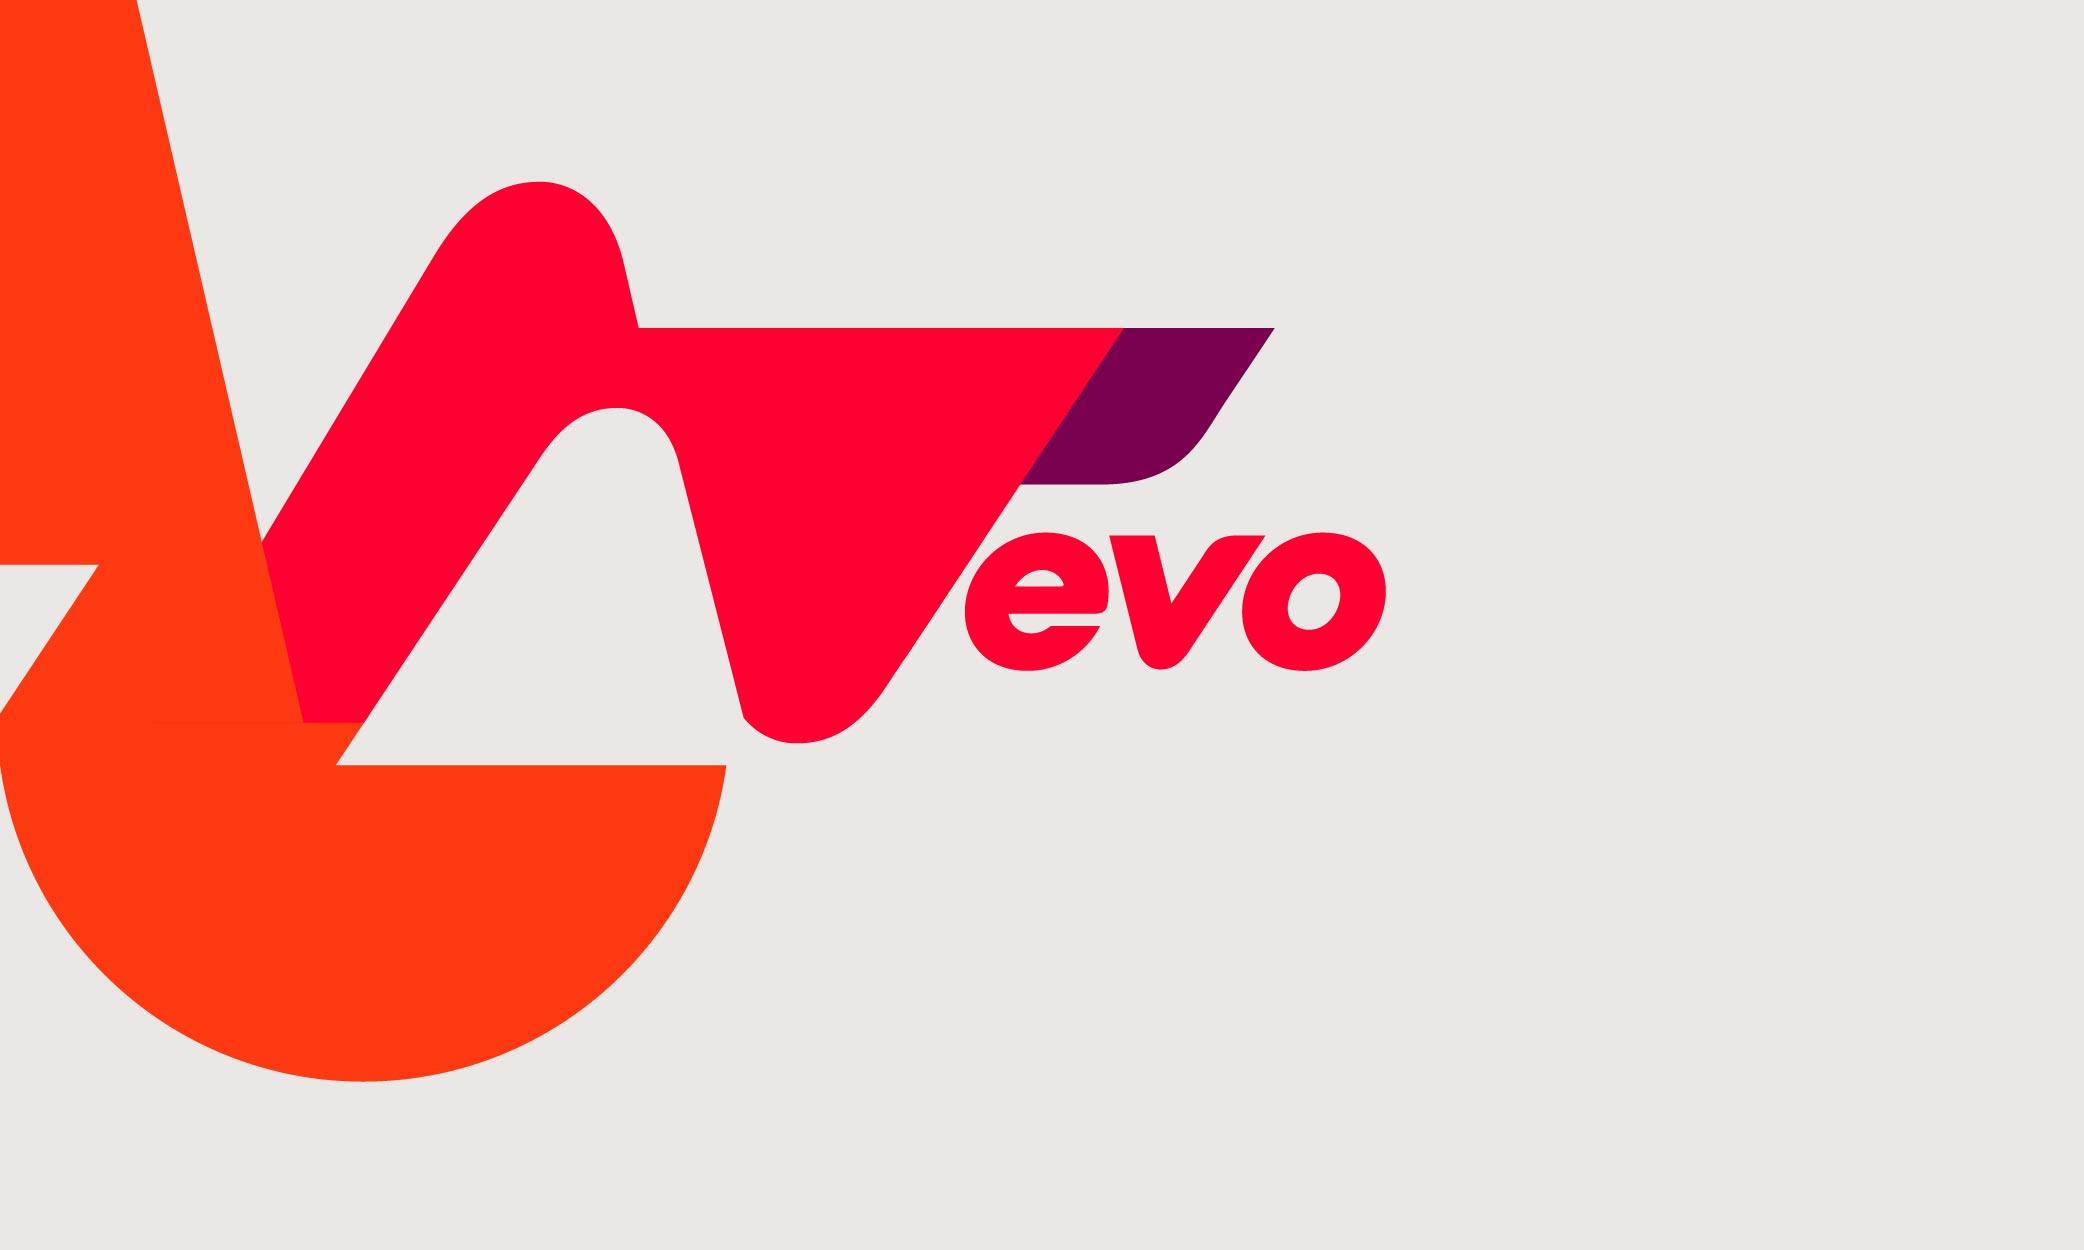 Vevo_Emblem-05